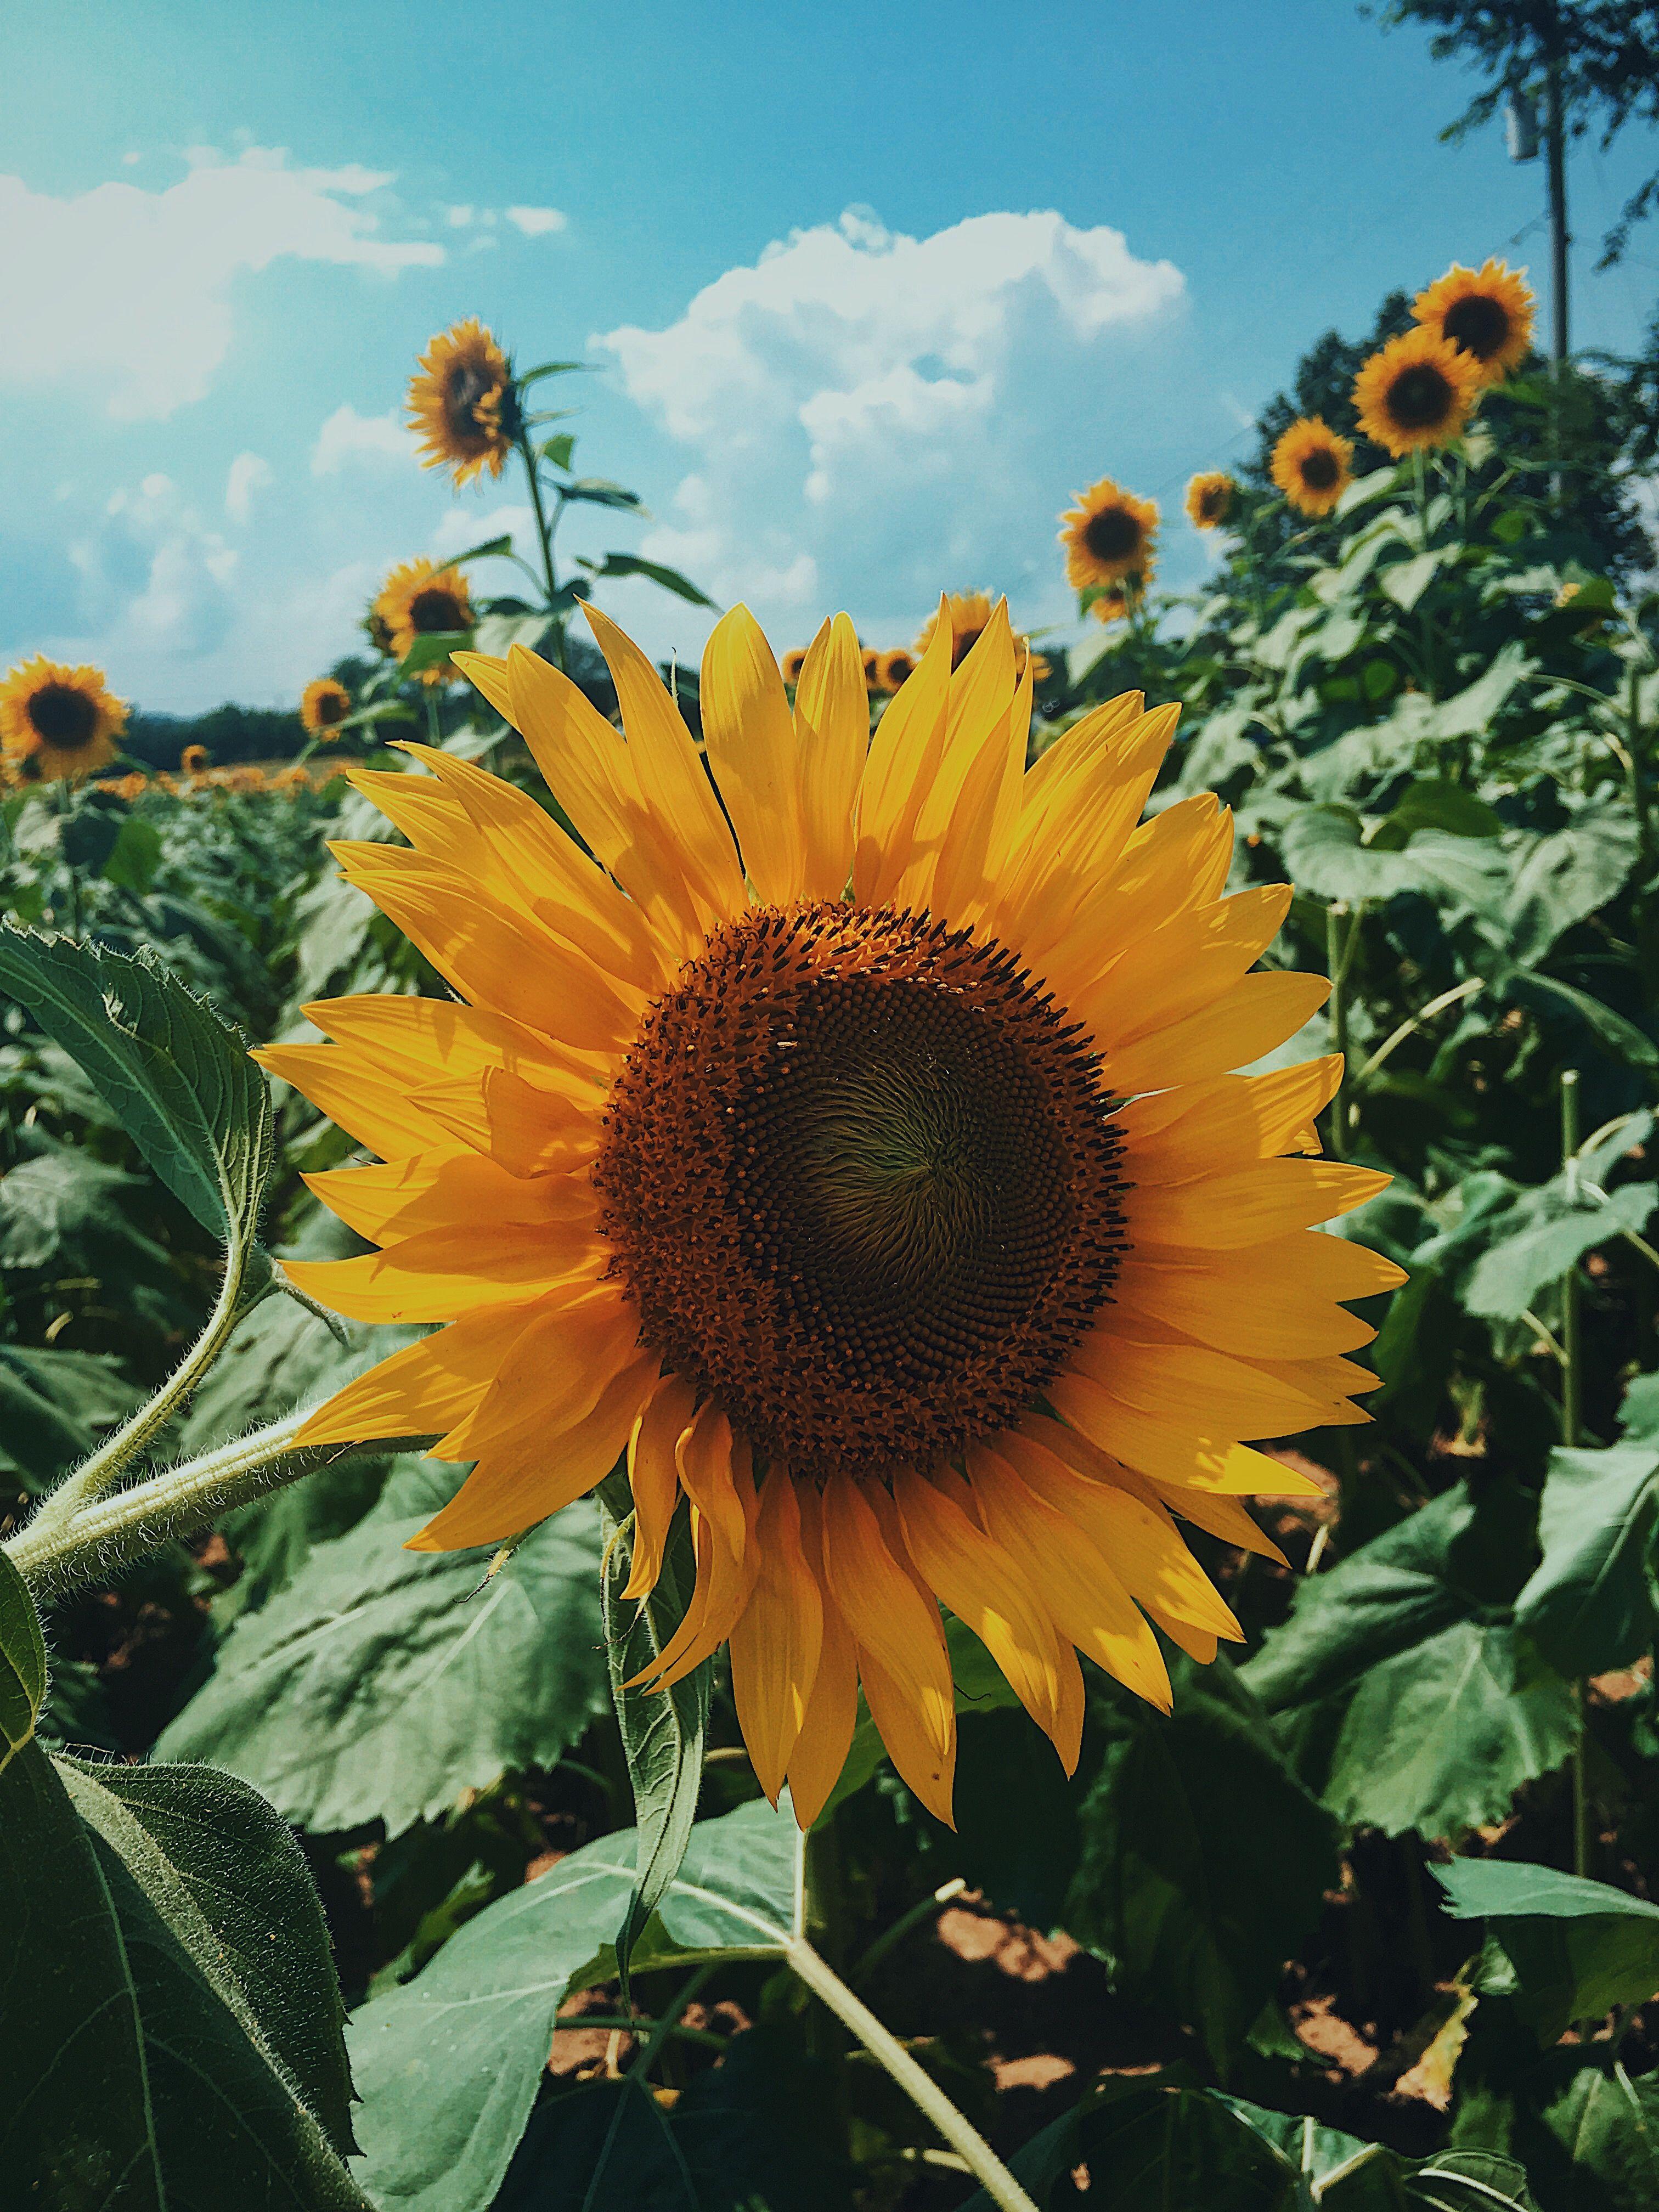 Sunflower Sunflower pictures